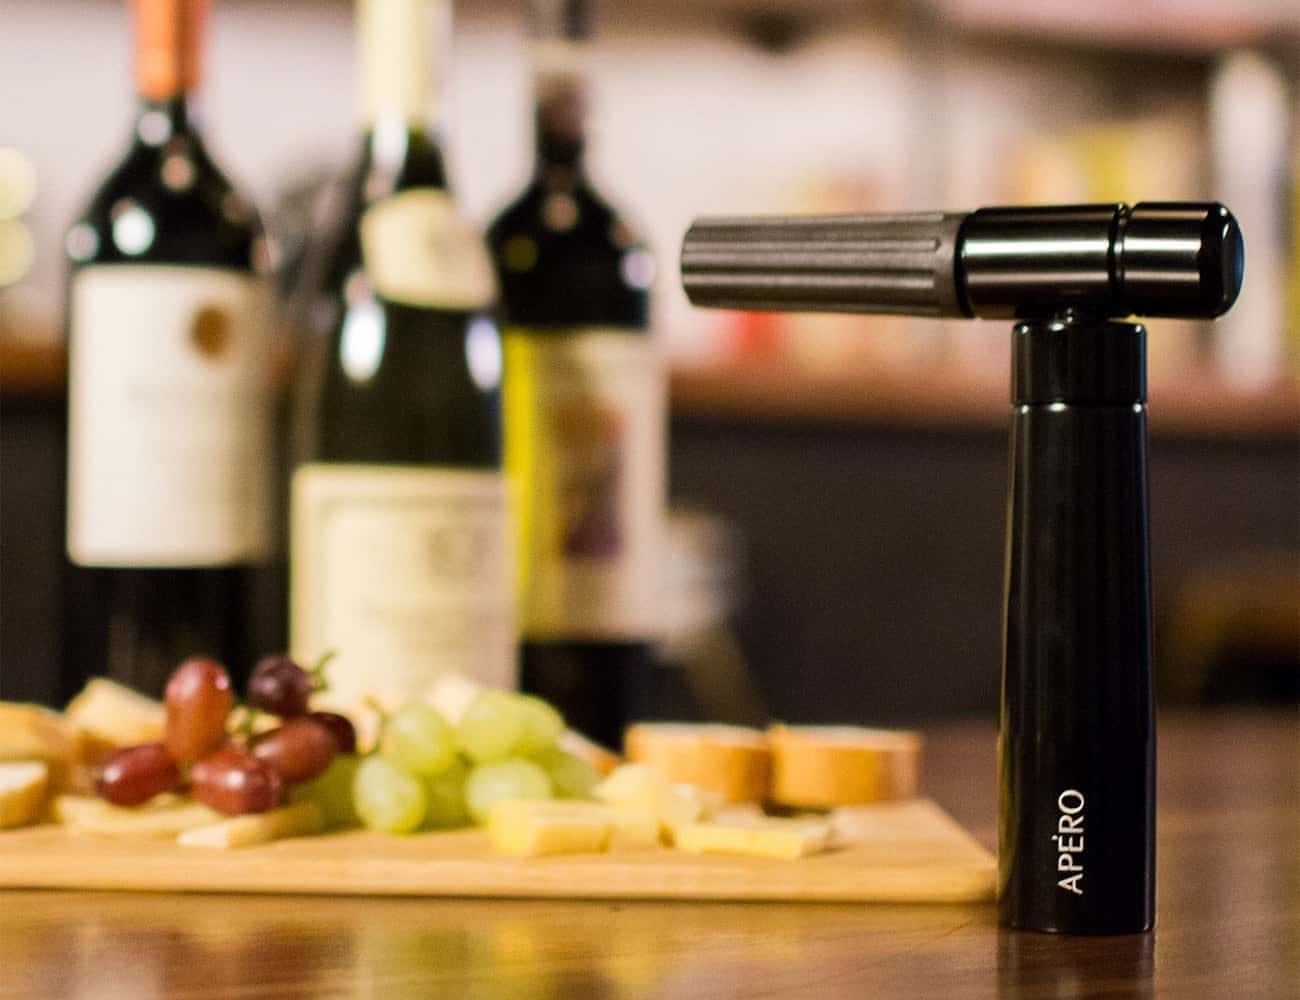 APERO N₂O Powered Wine Opener